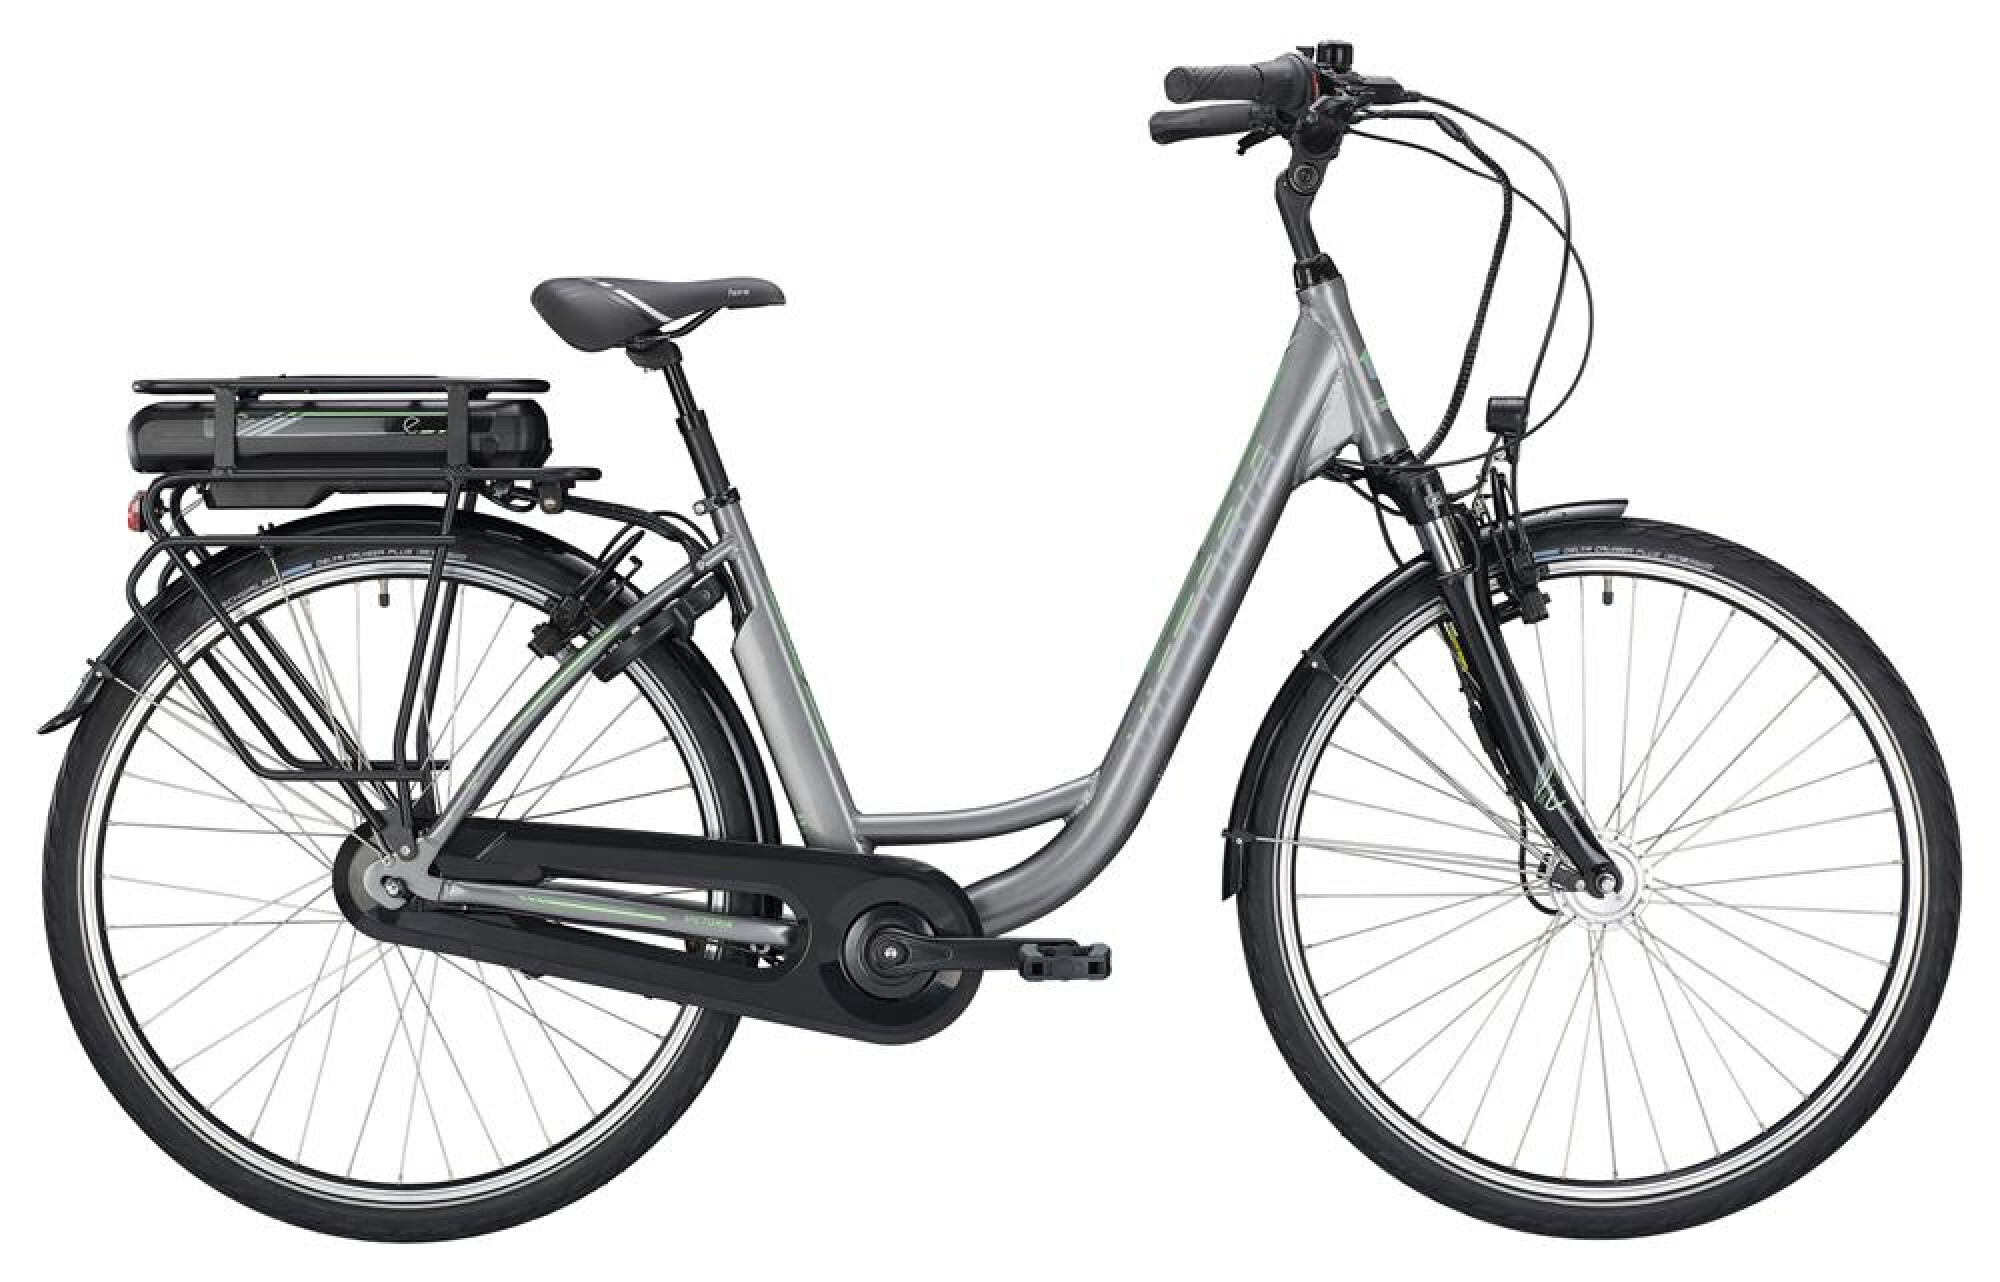 e bike victoria eclassic 3 1 h deep darkgrey limegreen 2019 bei alle details und. Black Bedroom Furniture Sets. Home Design Ideas